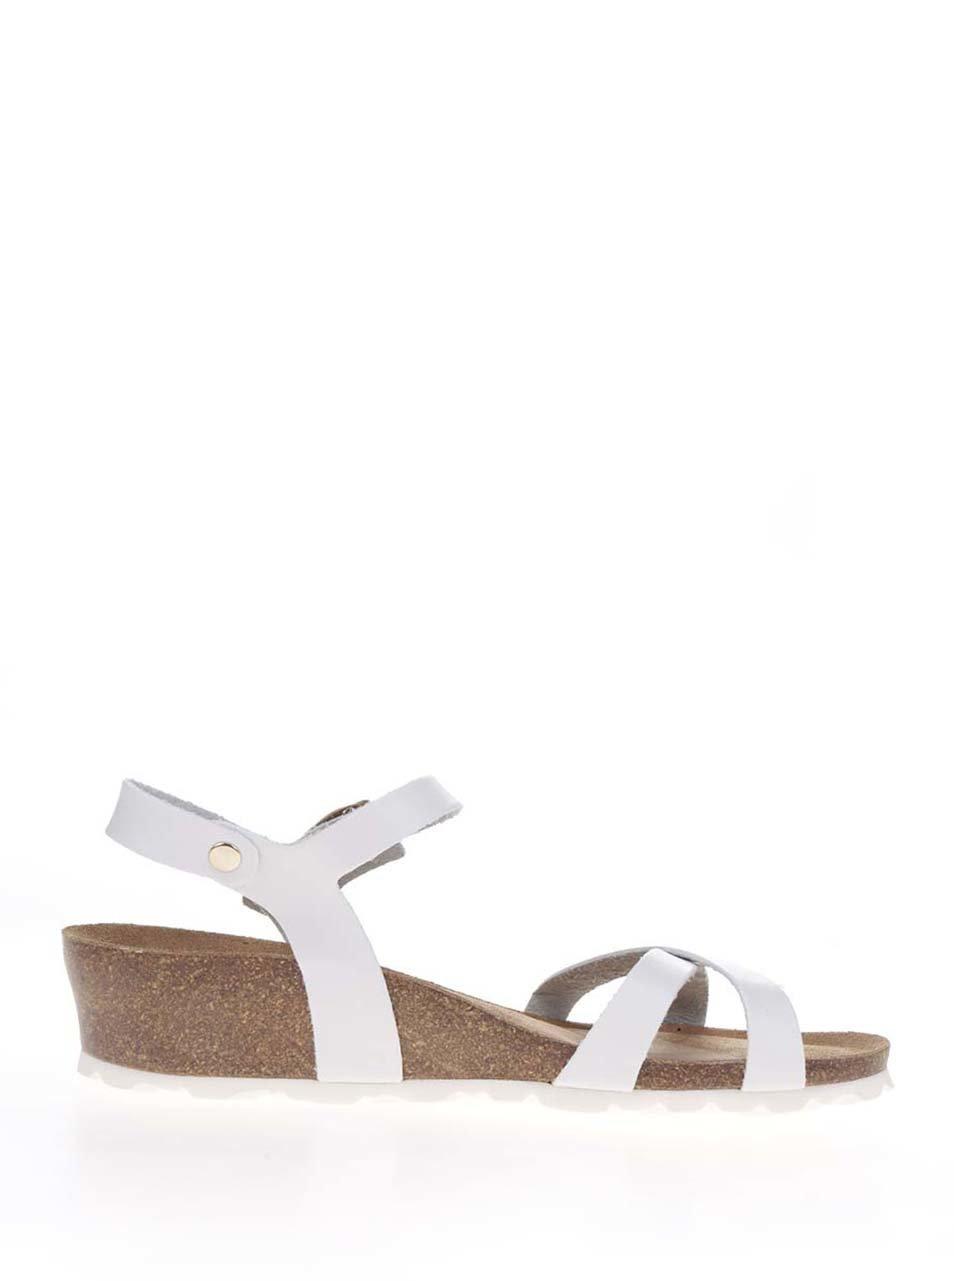 acae438635e3 Biele dámske sandále na platforme OJJU ...